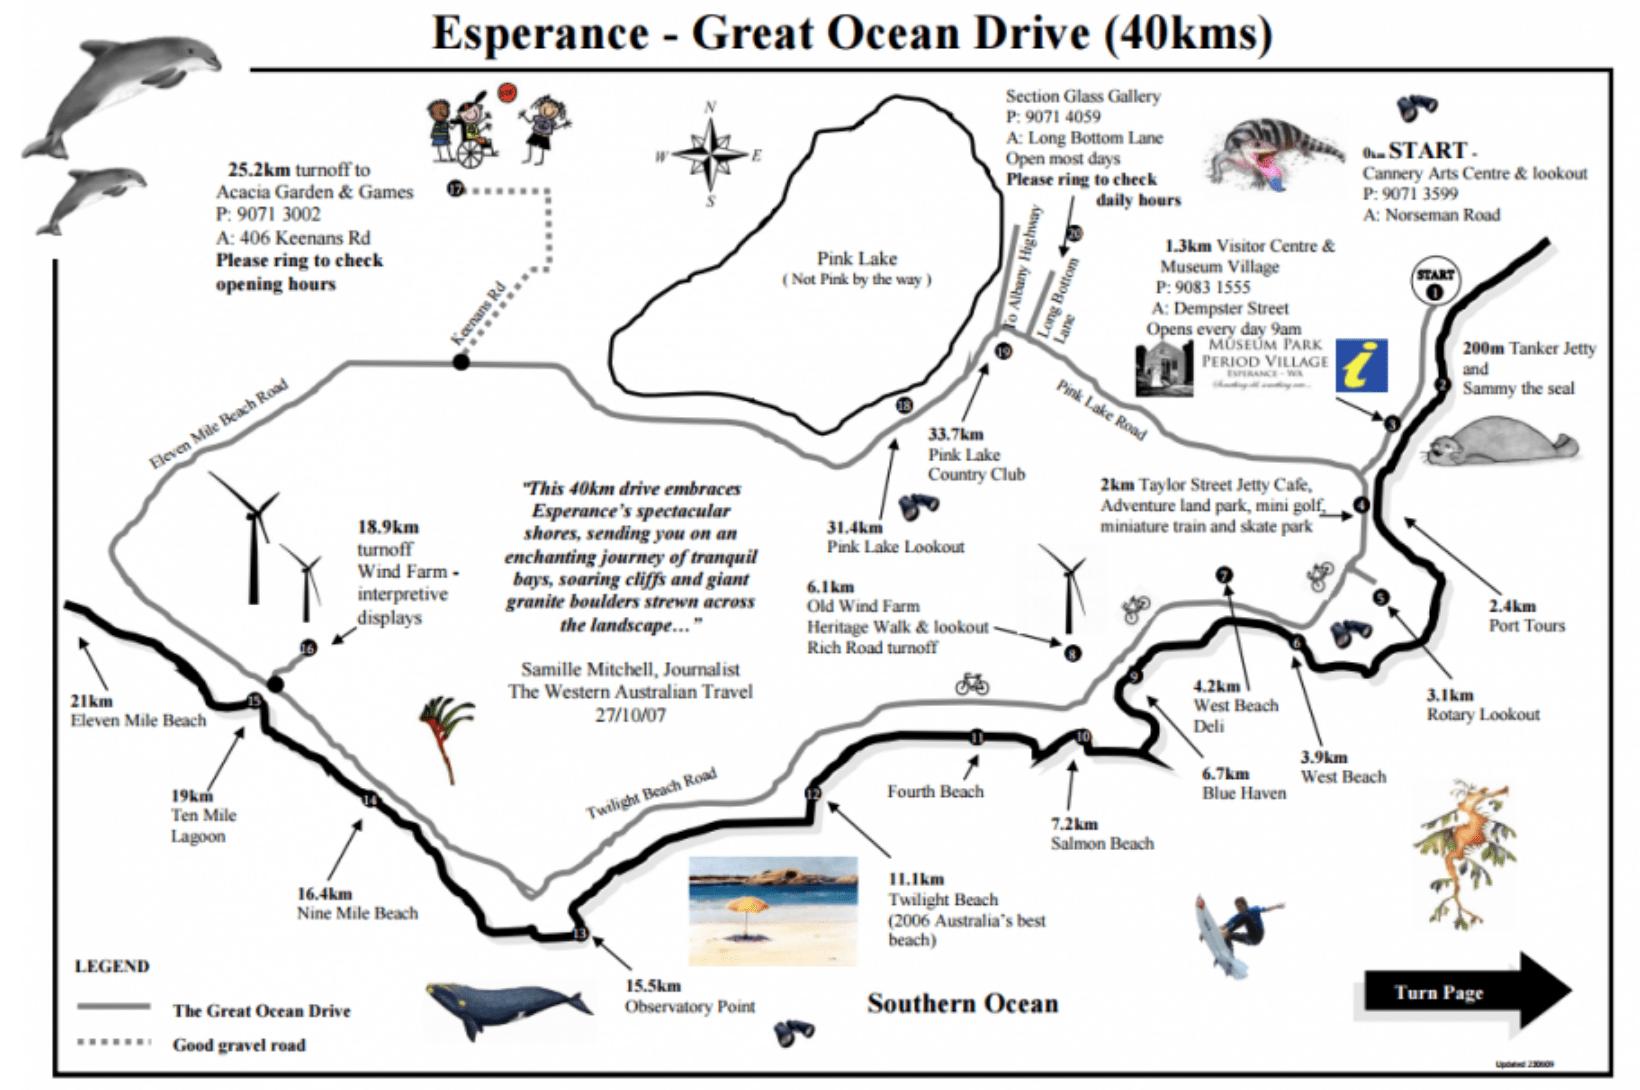 Great Ocean Drive Esperance sud australie